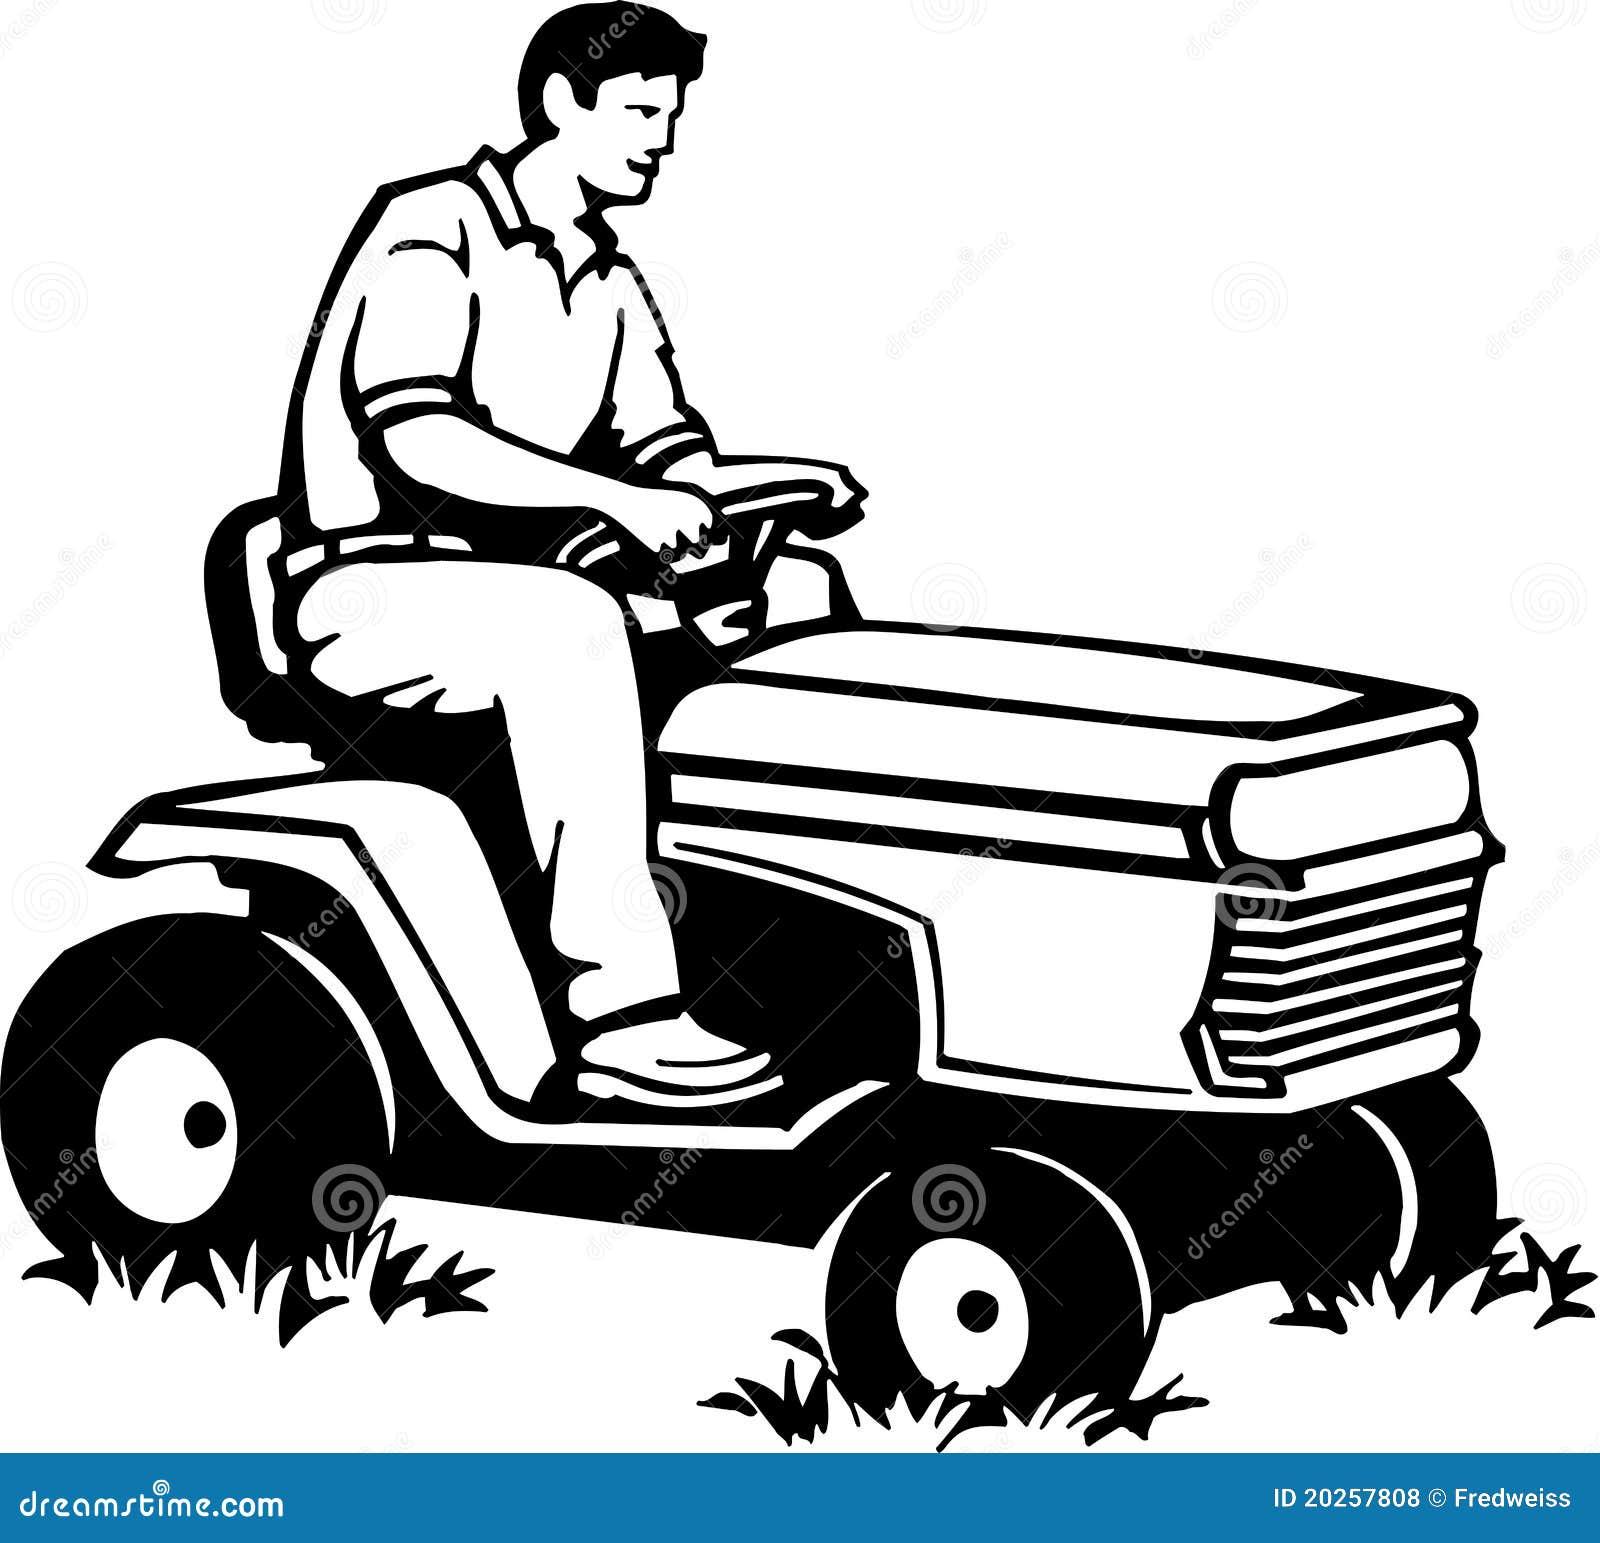 Riding Lawn Mower Royalty Free Stock Photos Image 20257808